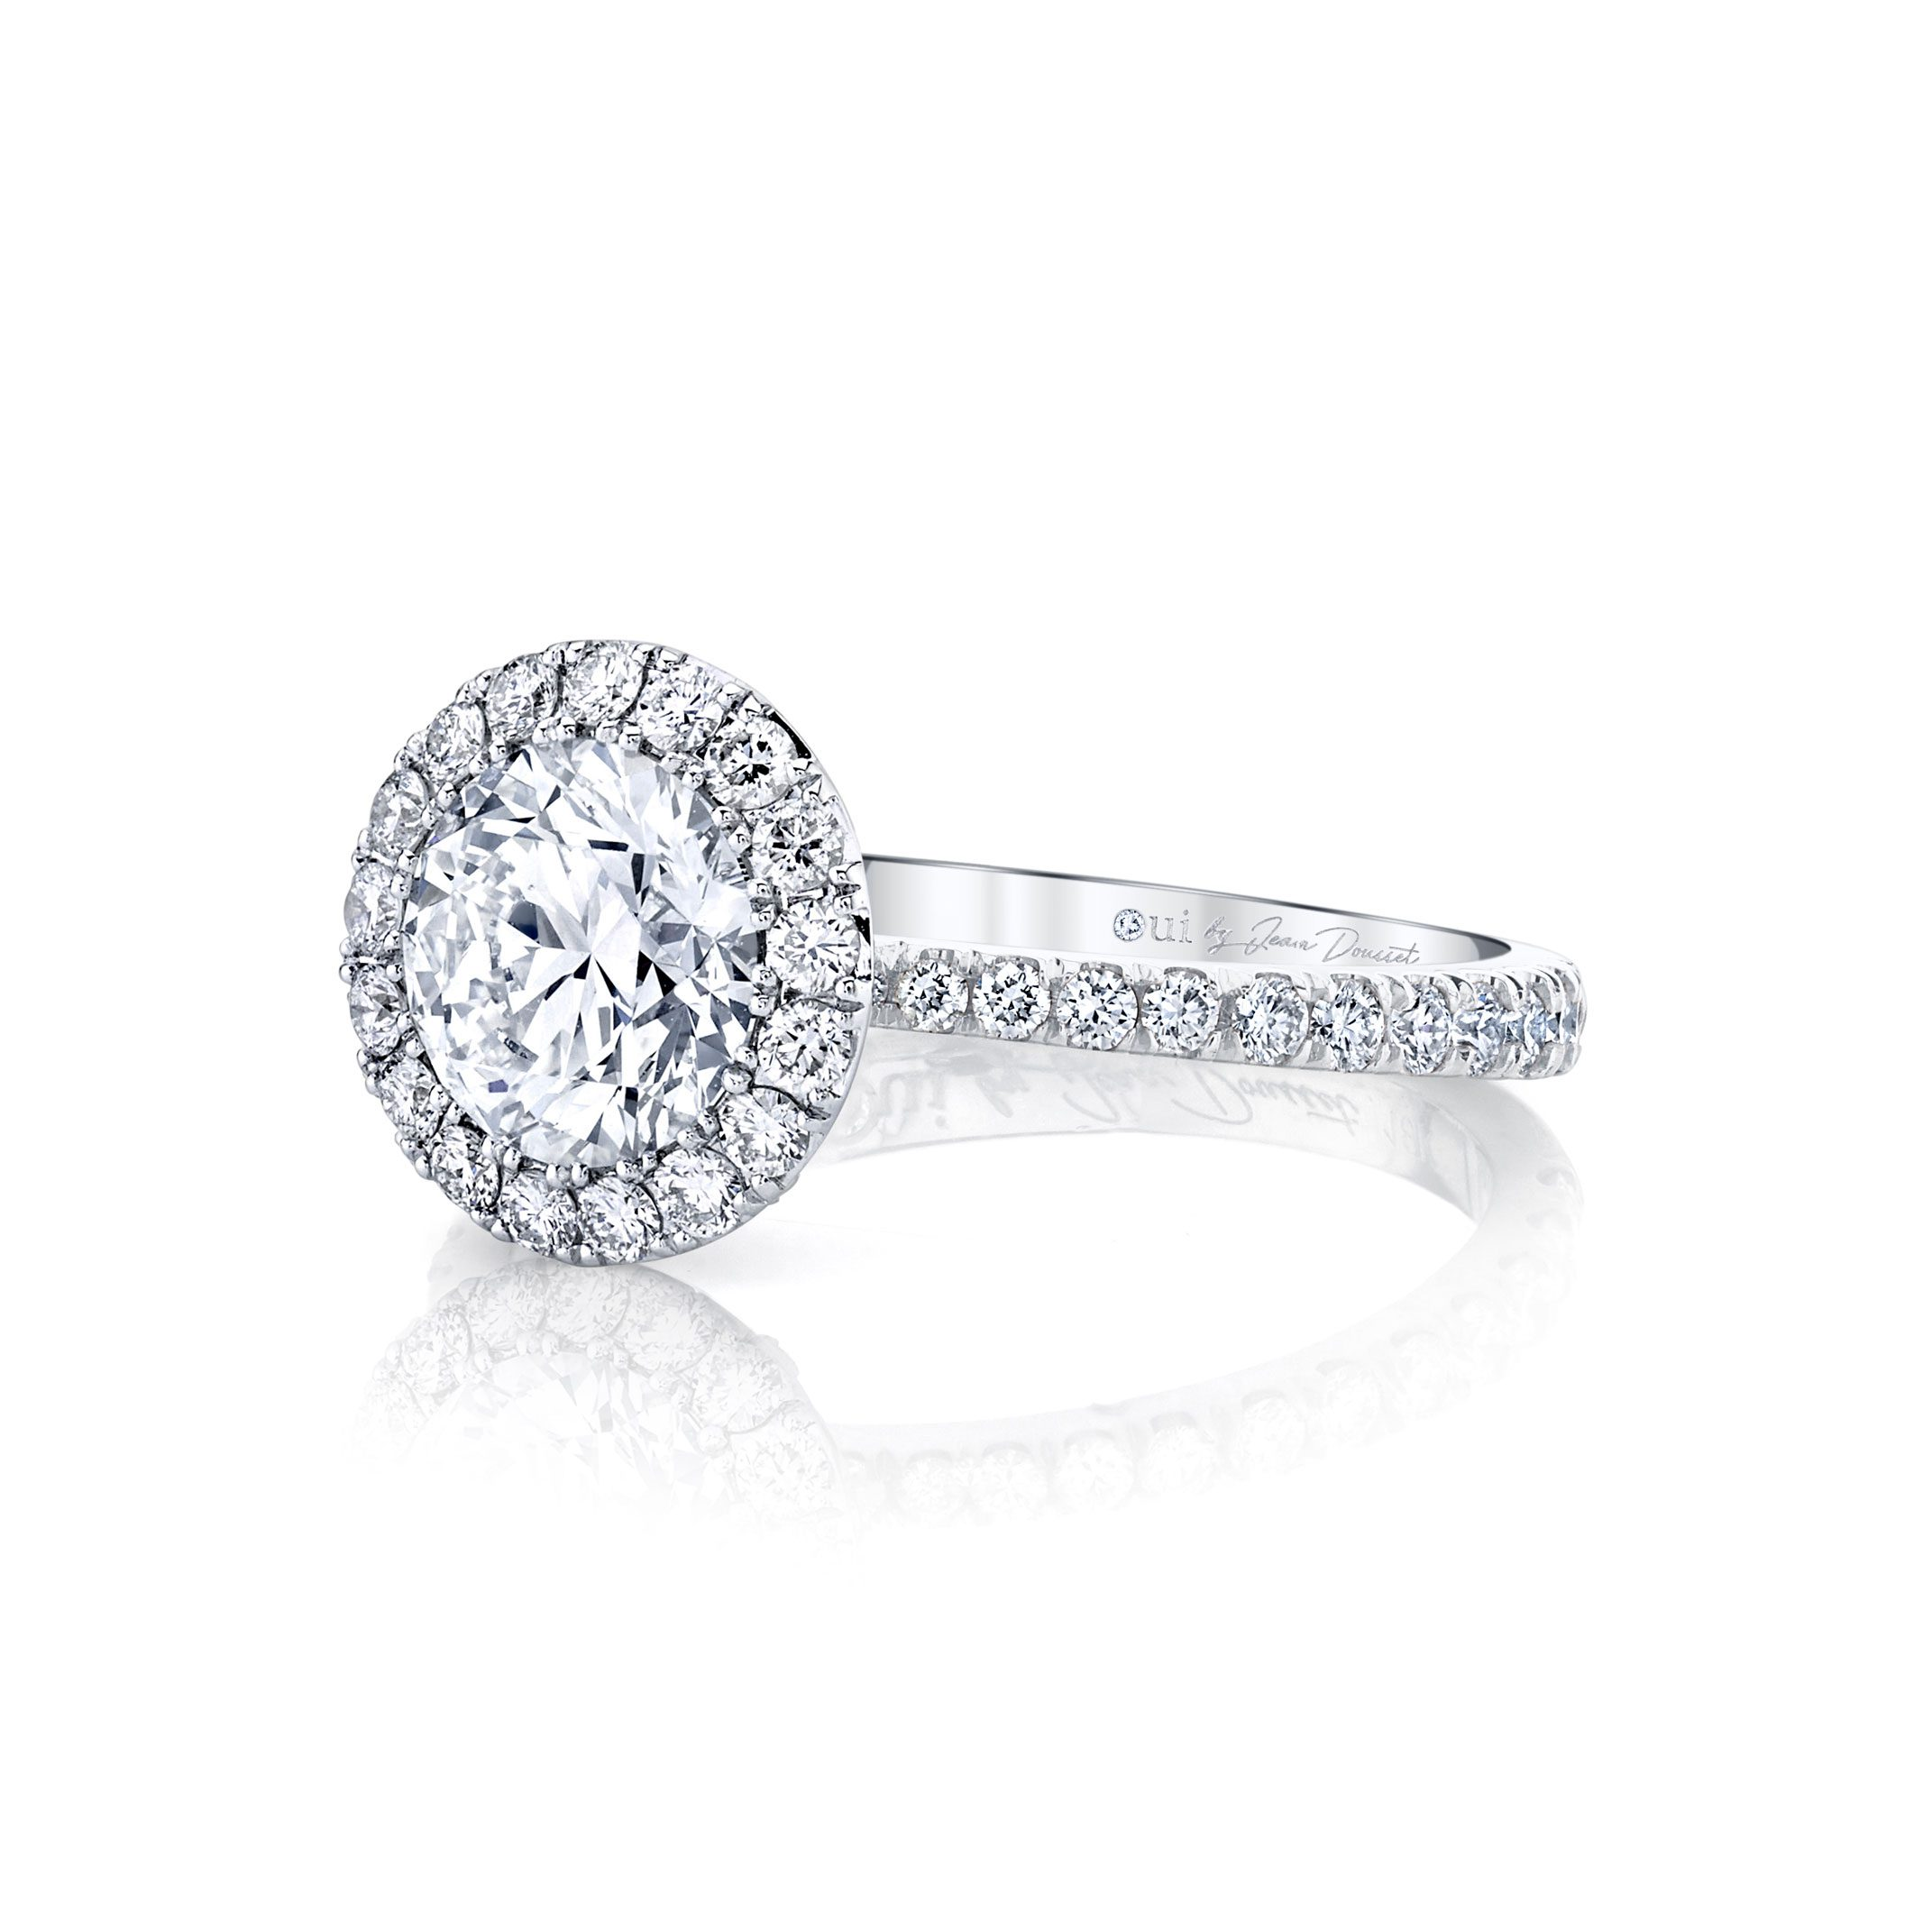 Eloise Seamless Halo® Round Brilliant Engagement Ring 18k White Gold Side Shot